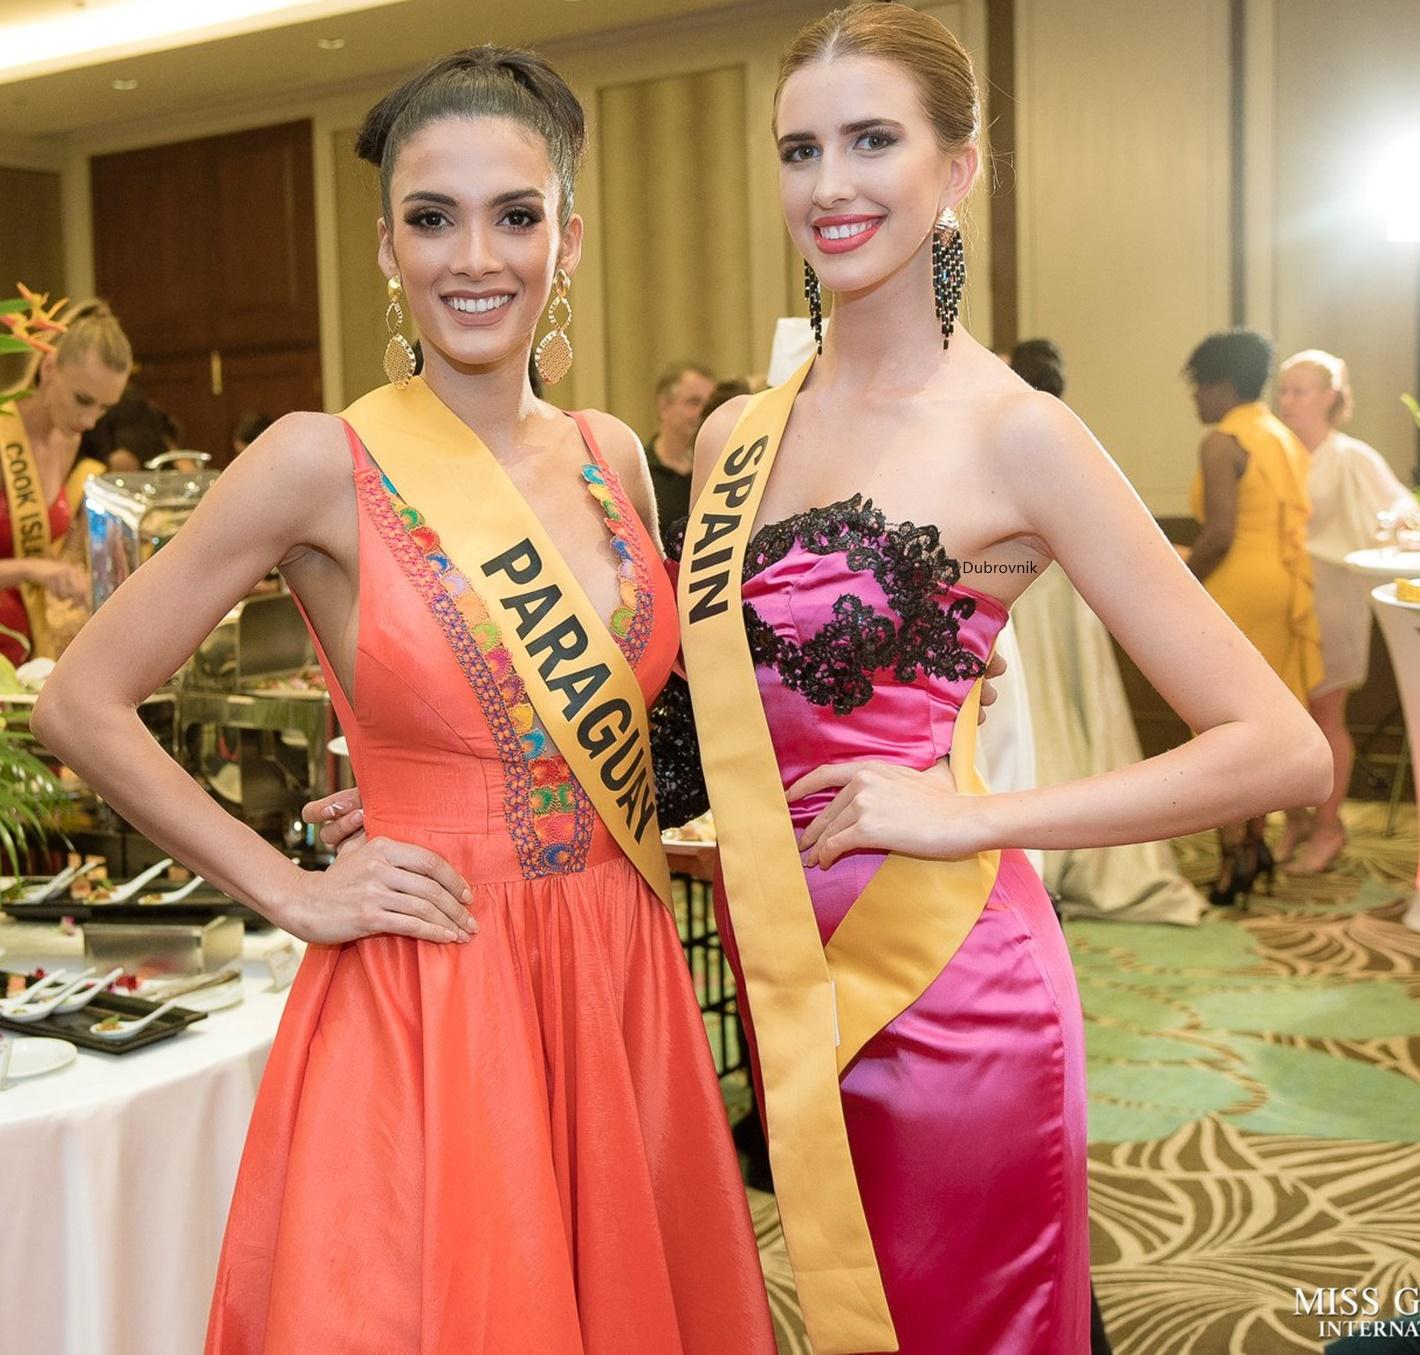 patricia lopez verdes, top 10 de miss grand international 2018. - Página 6 2wn8b610